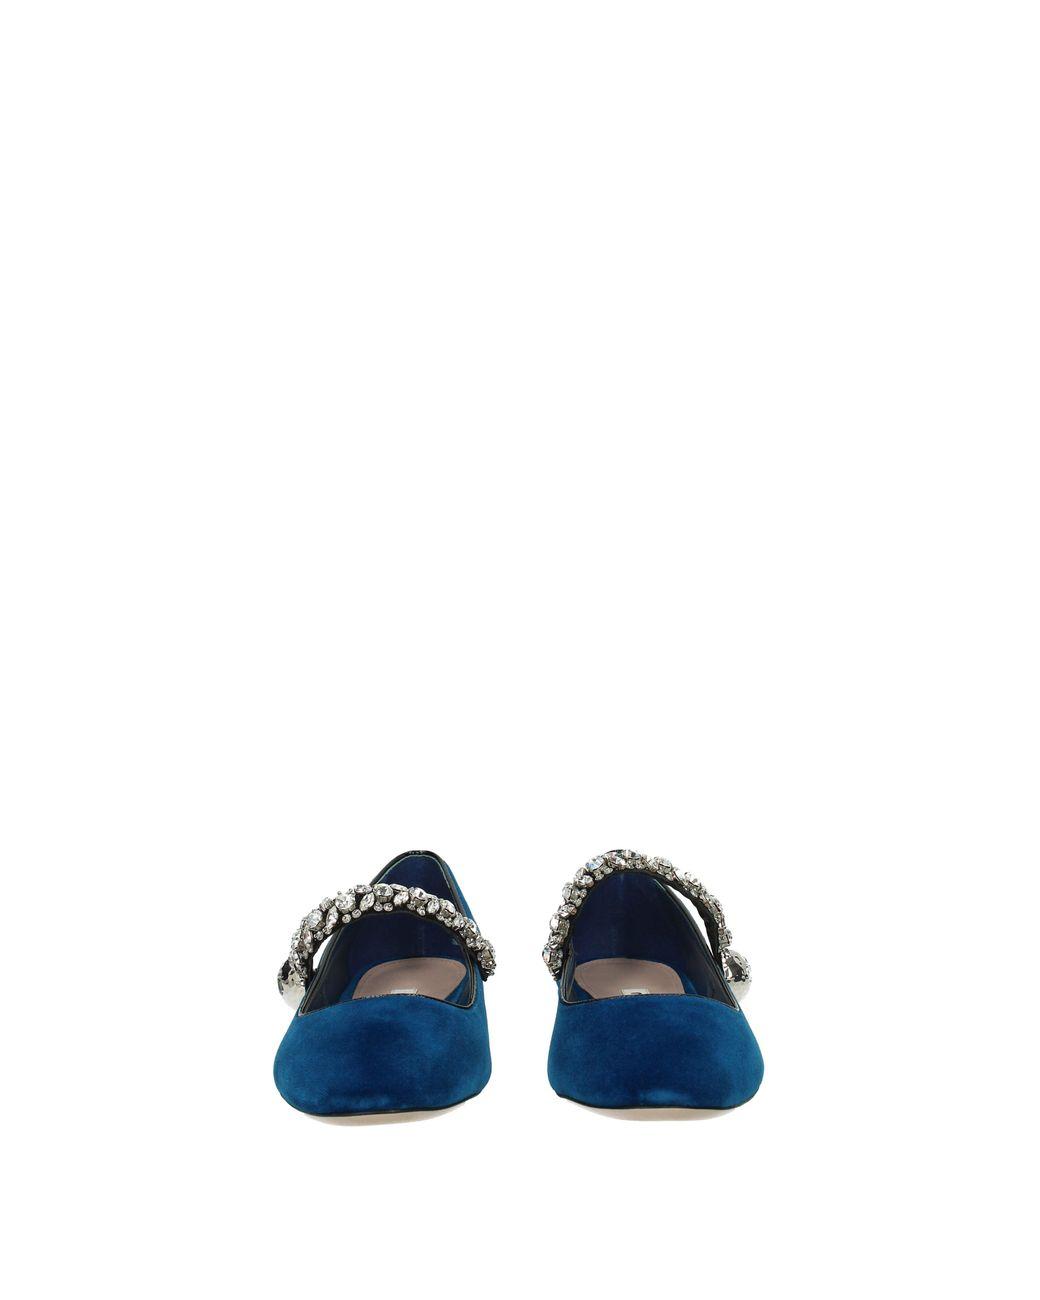 c72770d8ae3 Lyst - Miu Miu Ballet Flats Women Blue in Blue